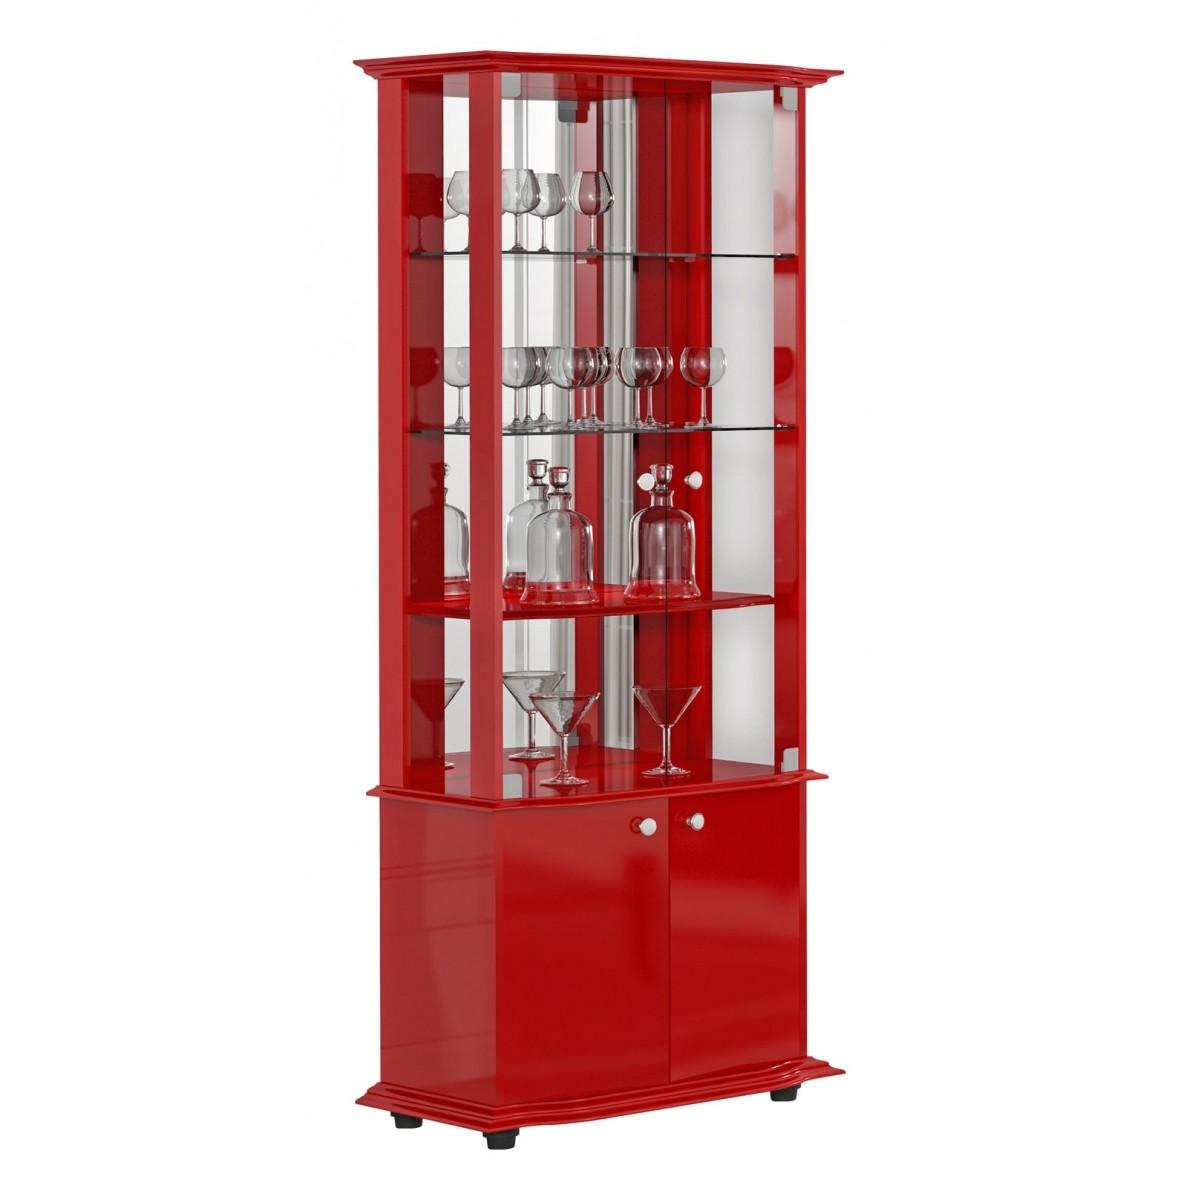 Cristaleira Monalisa Vermelha Imcal